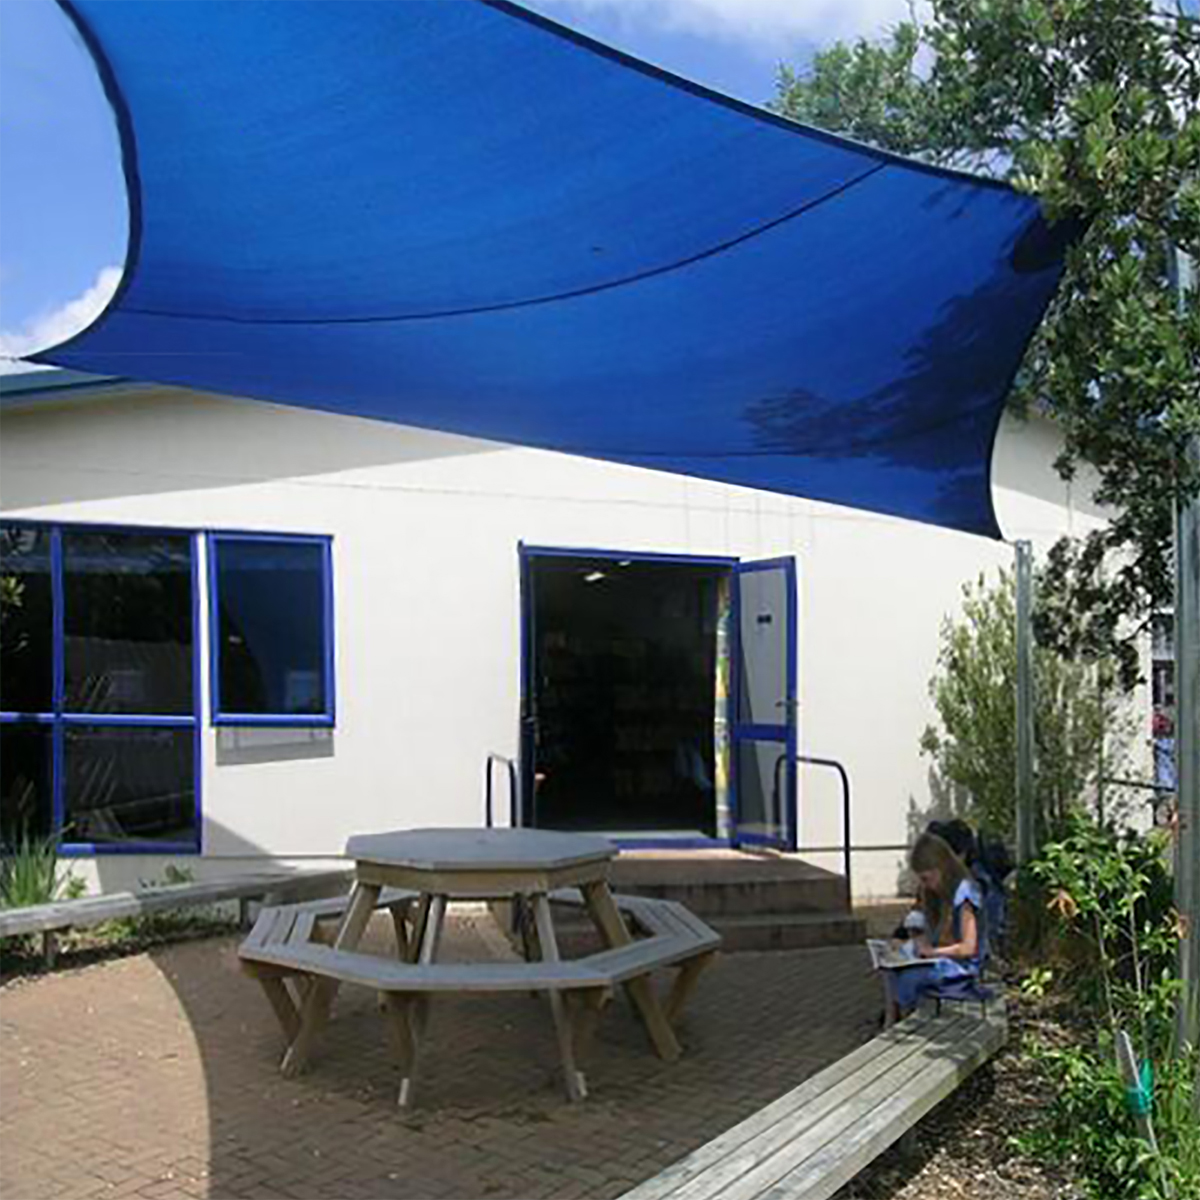 waterproof sun shade sail uv blocker patio paradise sail rectangle canopy permeable uv block fabric durable outdoor swimming backyard playground